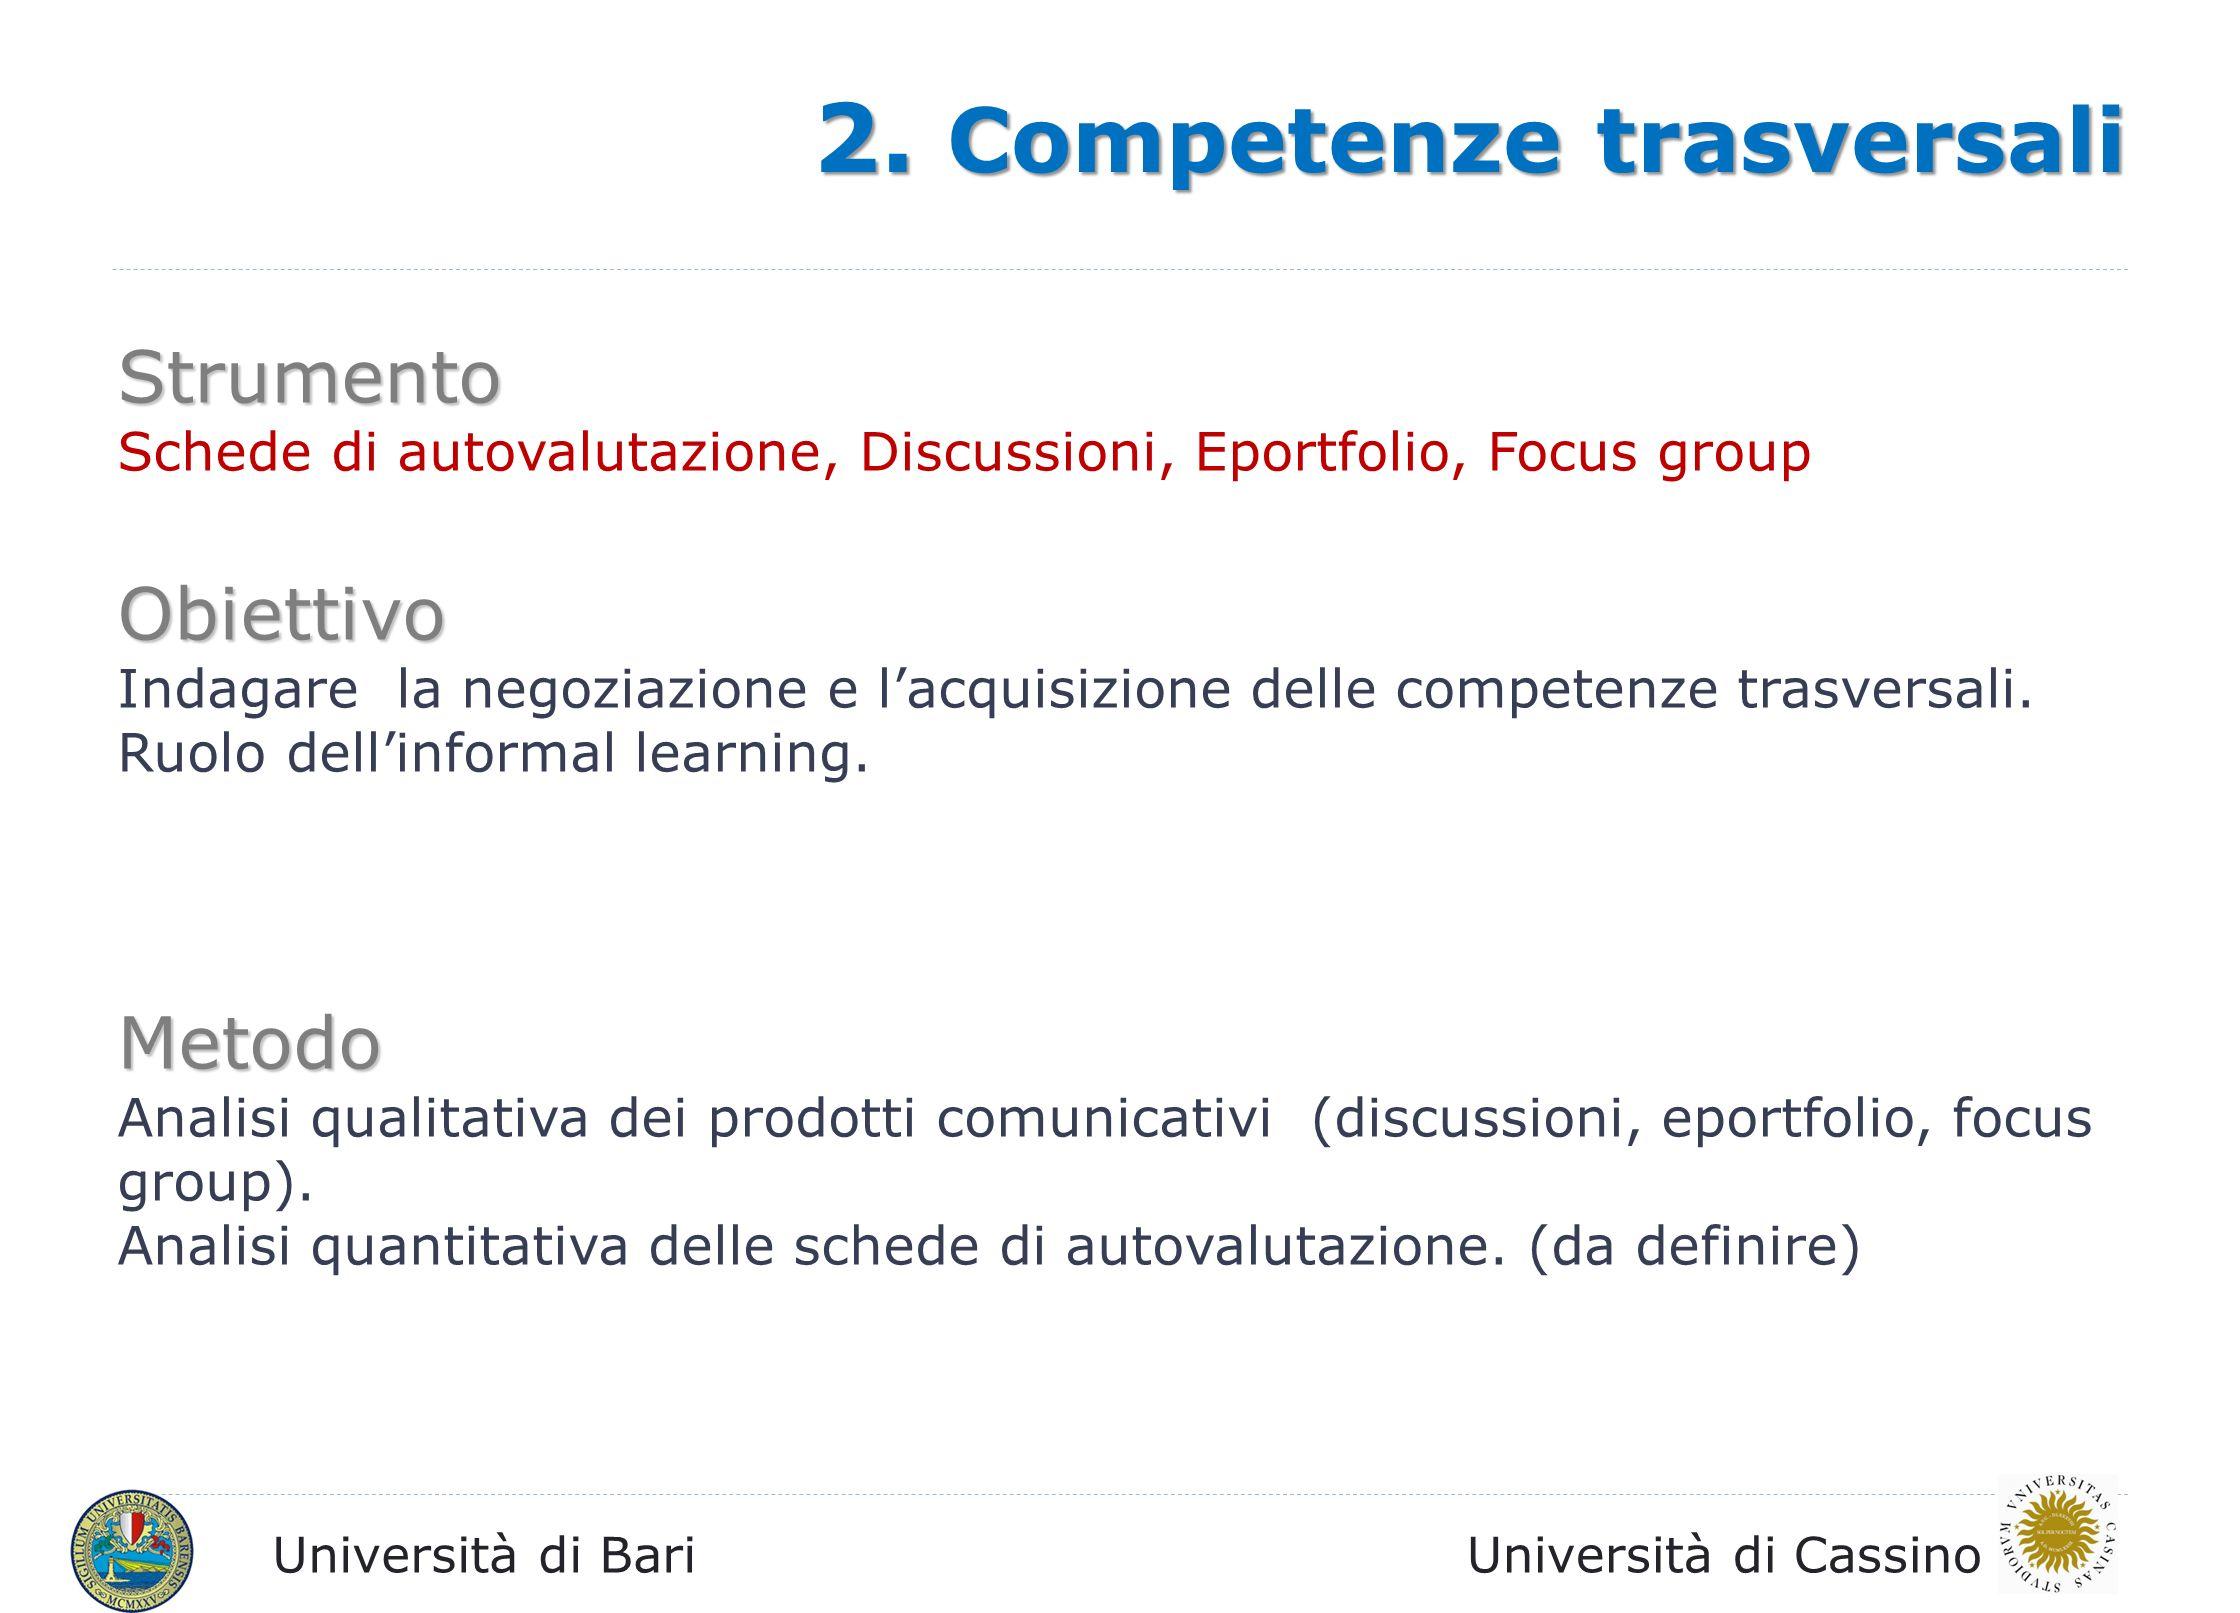 2. Competenze trasversali